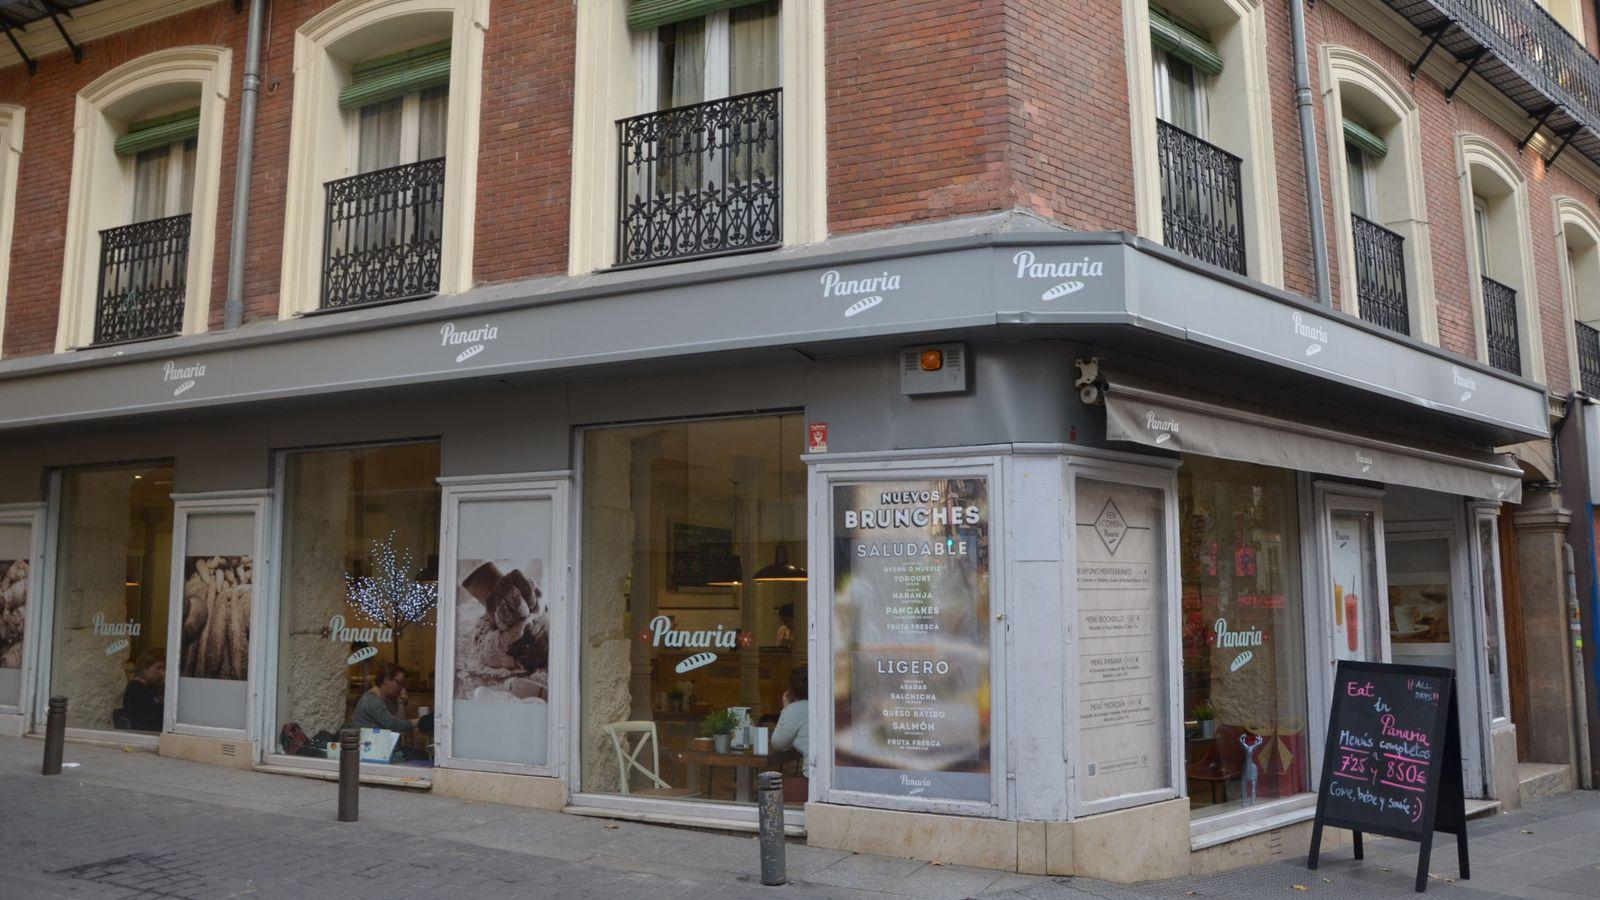 Foto: Local de renta antigua en Madrid. (Foto: Elena Sanz)